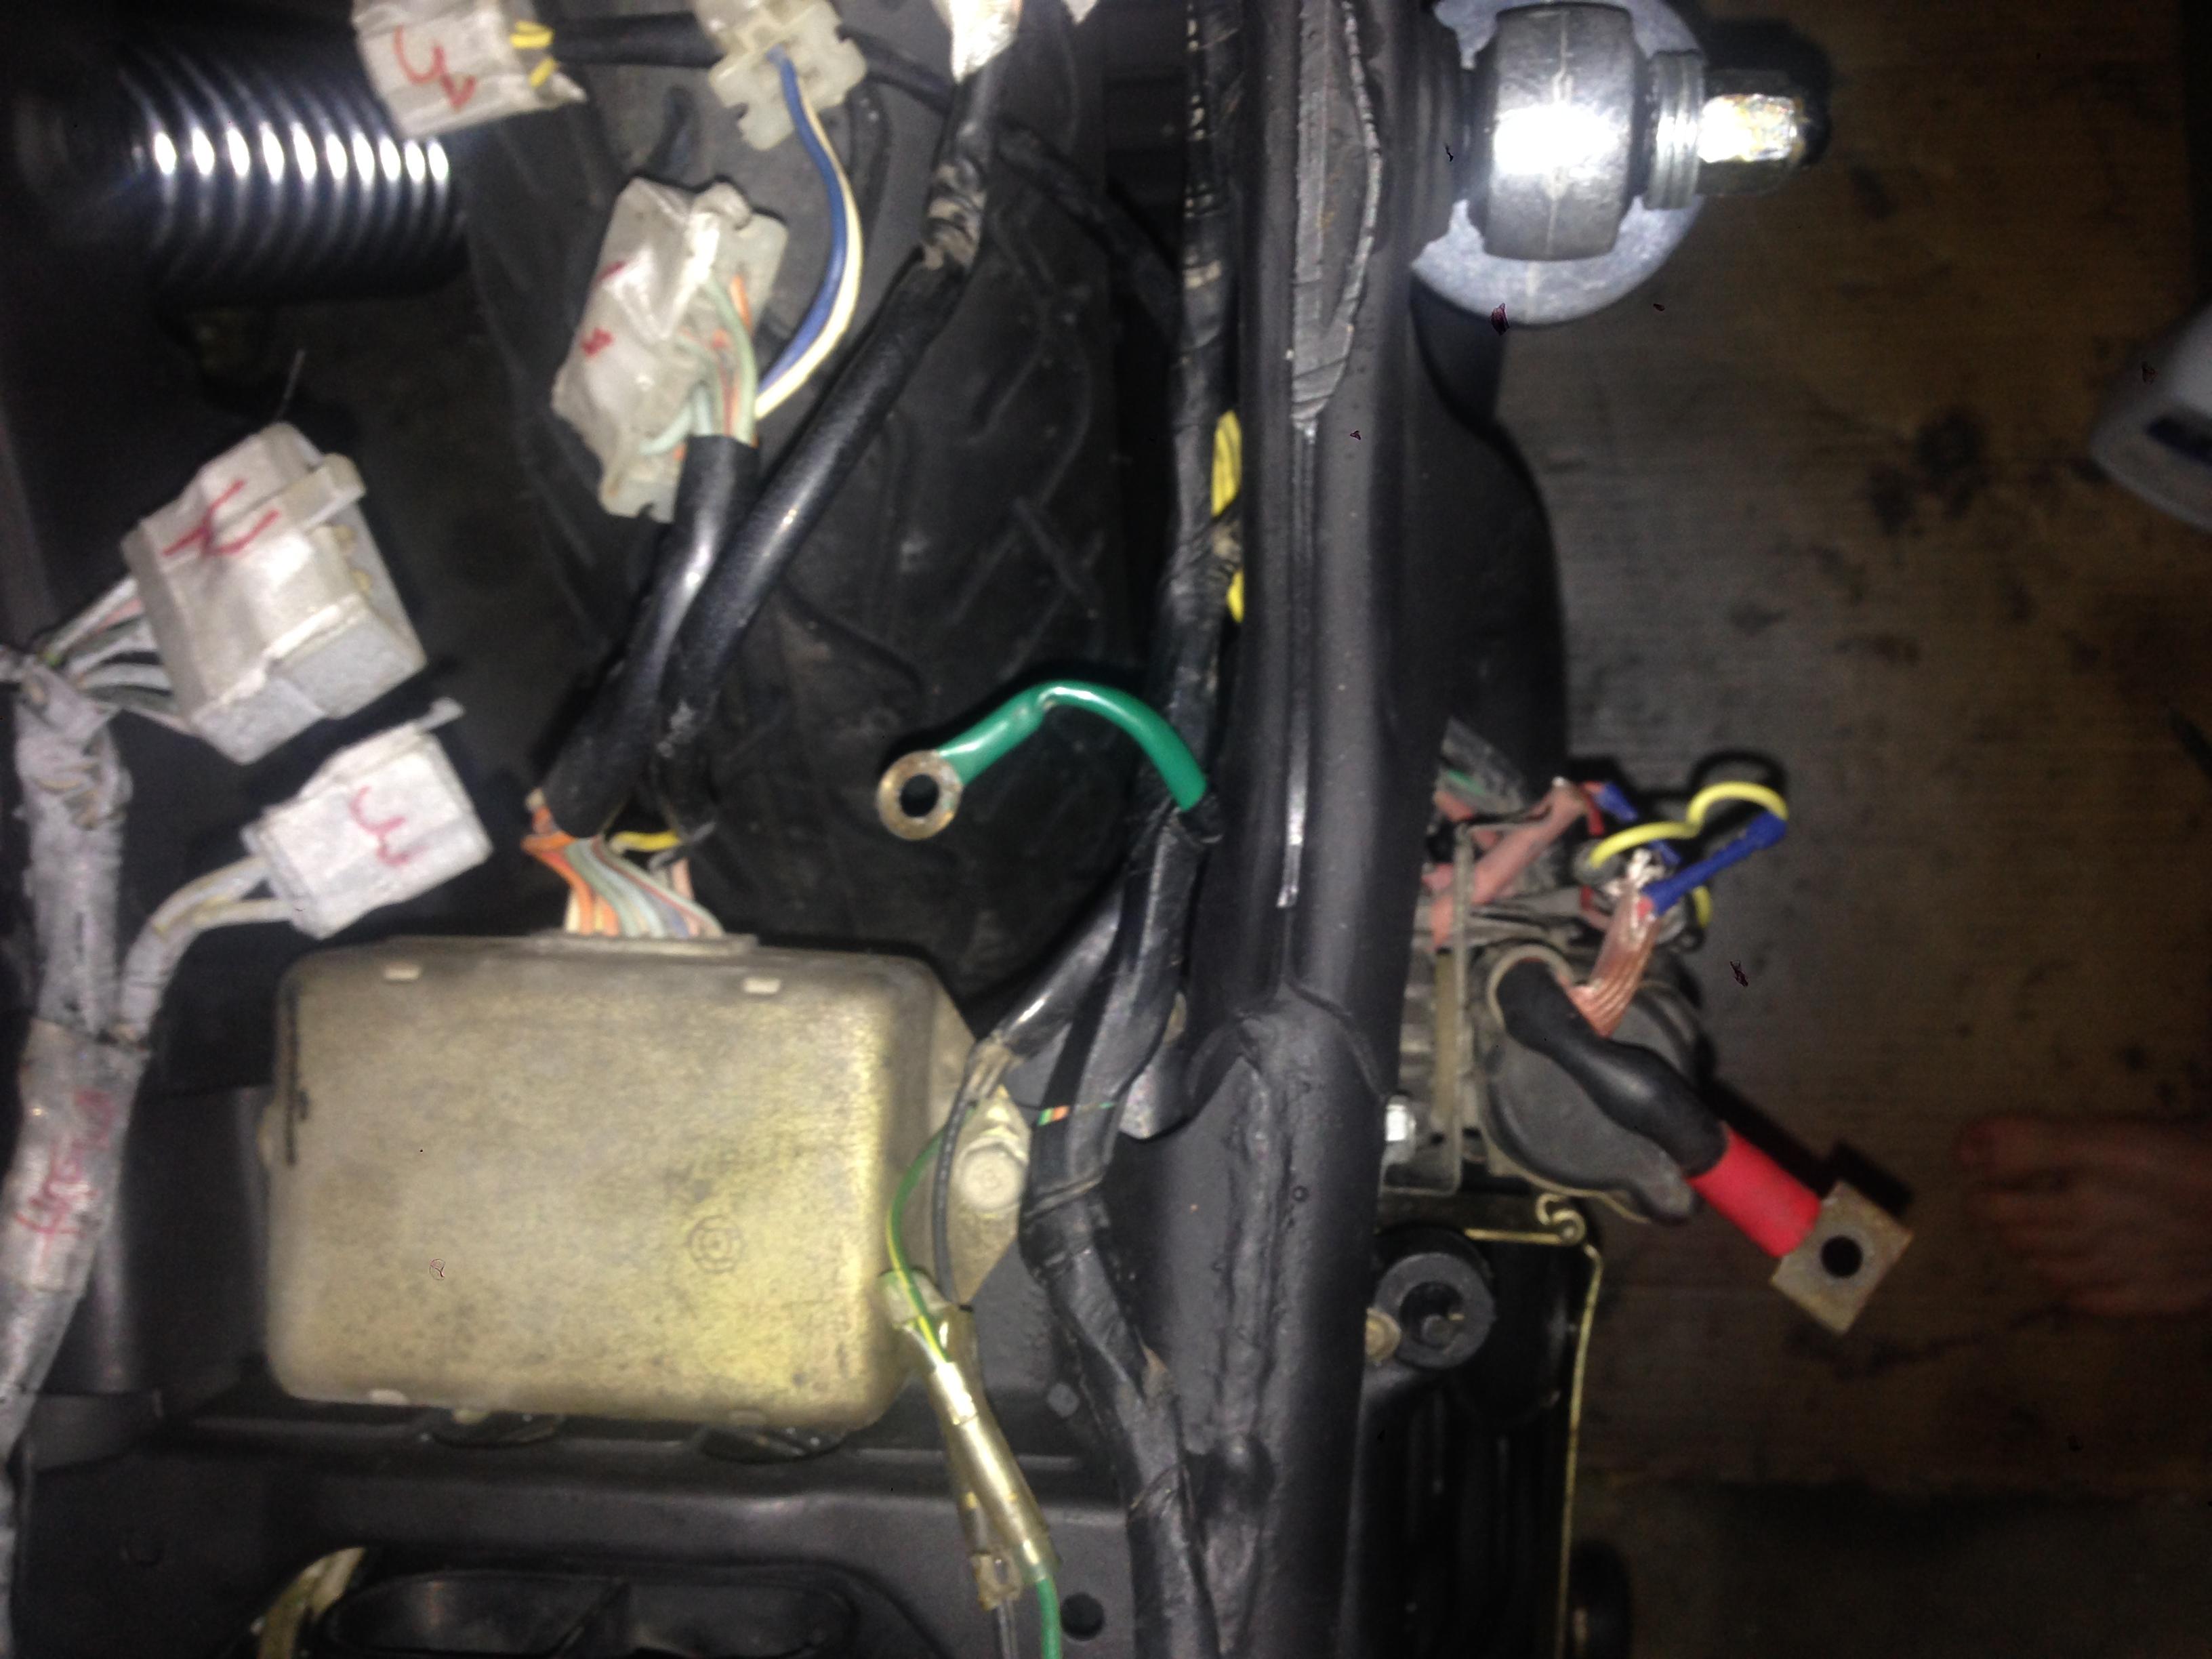 12330d1403454817 1978 honda cx500 wiring help photo 2 2 1978 honda cx500 wiring help 78 cx500 wiring diagram at soozxer.org